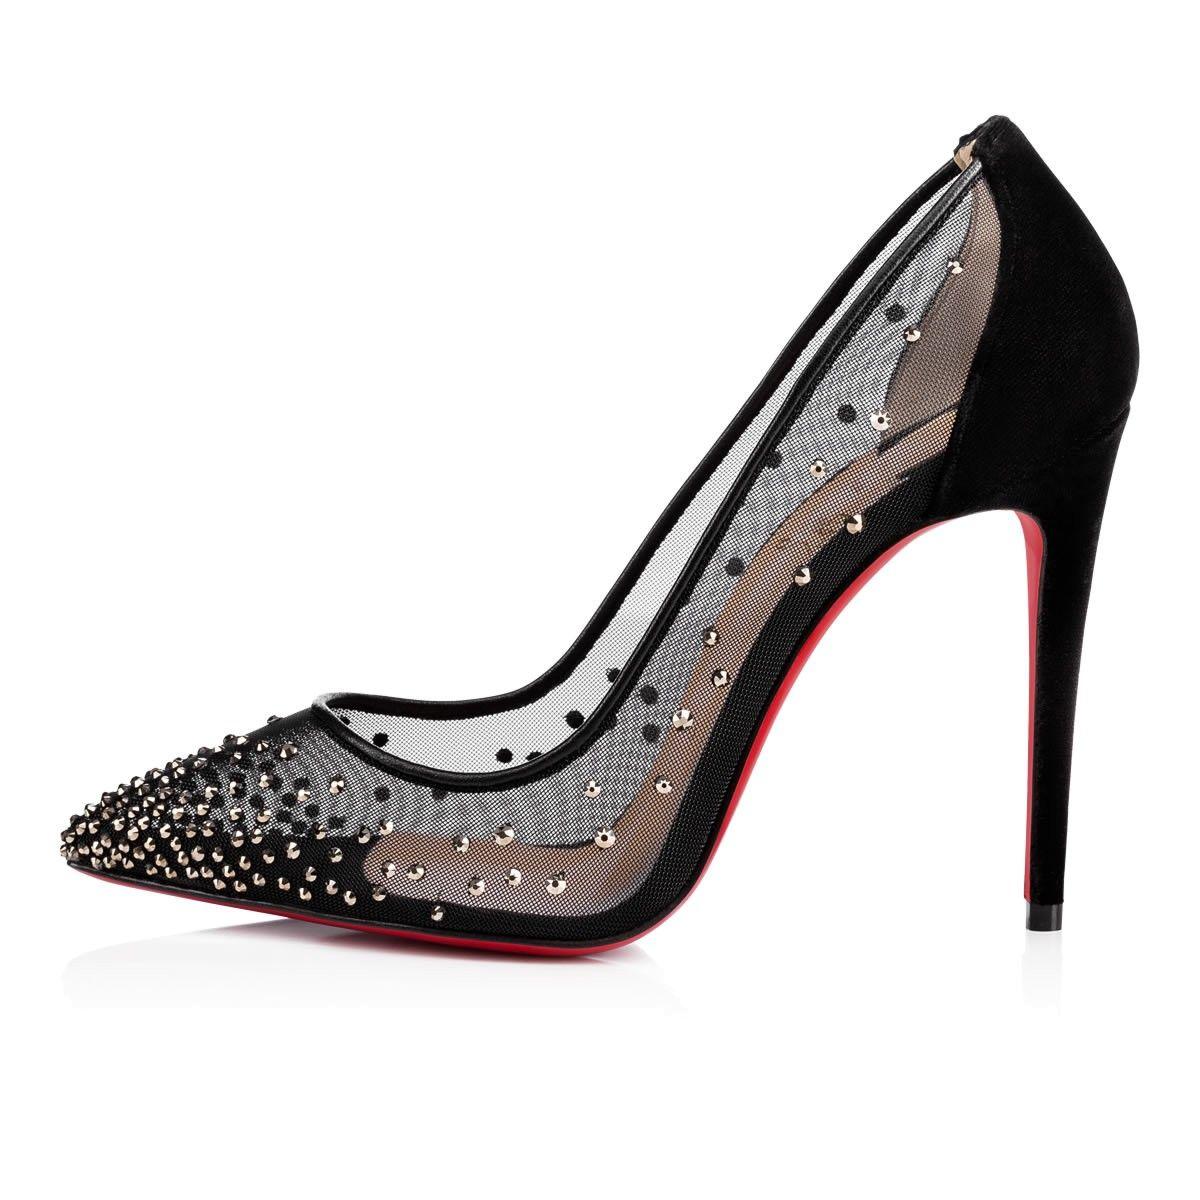 424f4e25742 Follies Strass 100 Version Crystal Met Strass - Women Shoes ...